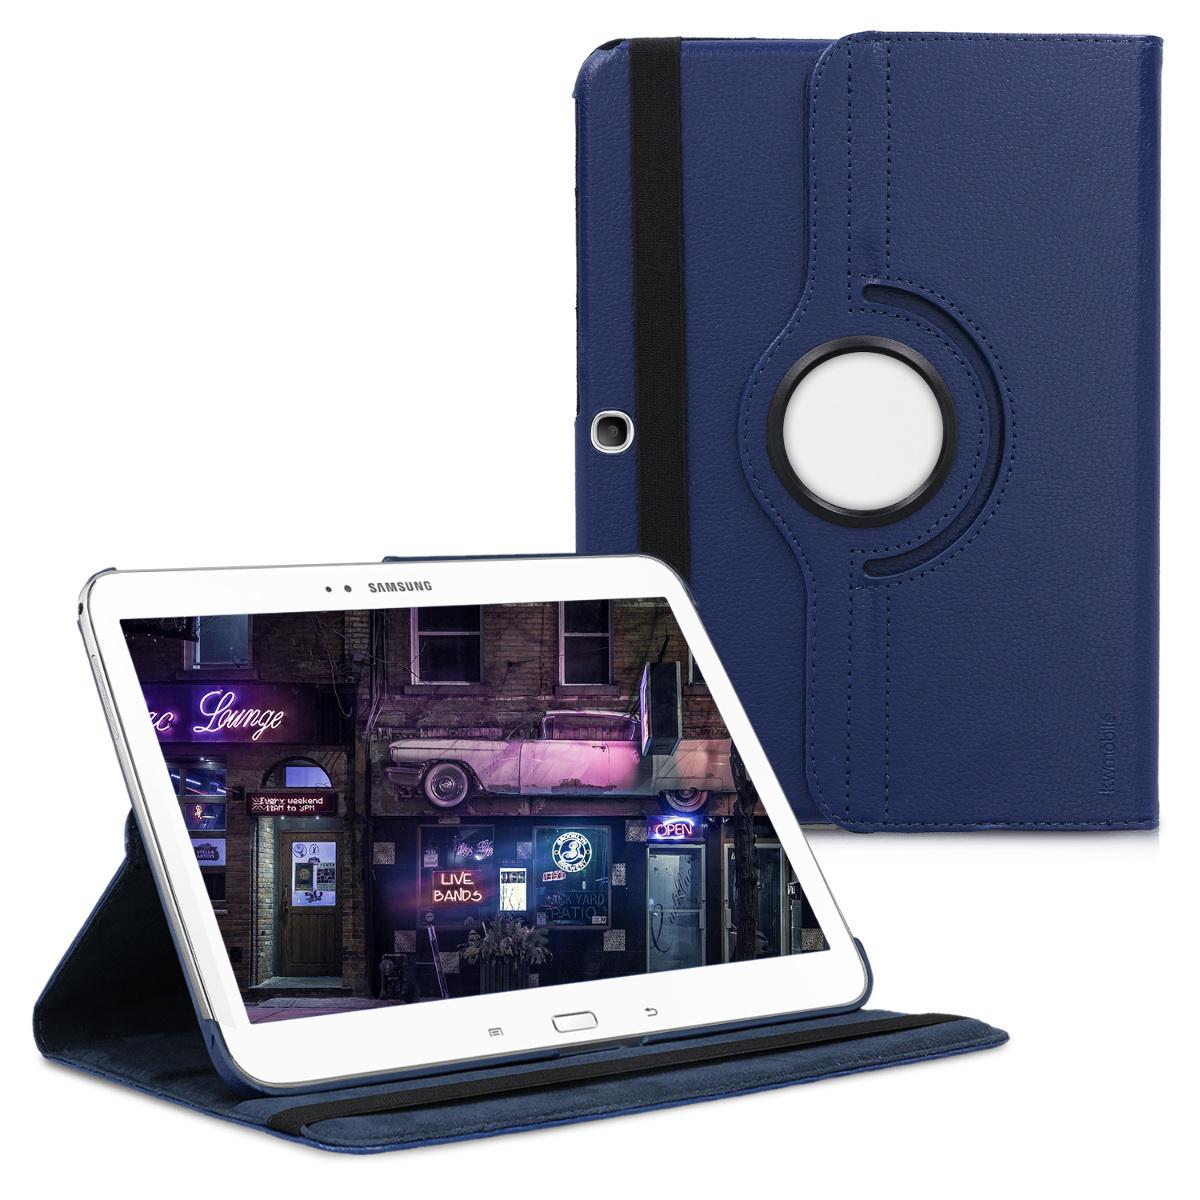 KW Θήκη 360° Samsung Galaxy Tab 3 10.1'' - Σκούρο μπλε (14618.17)